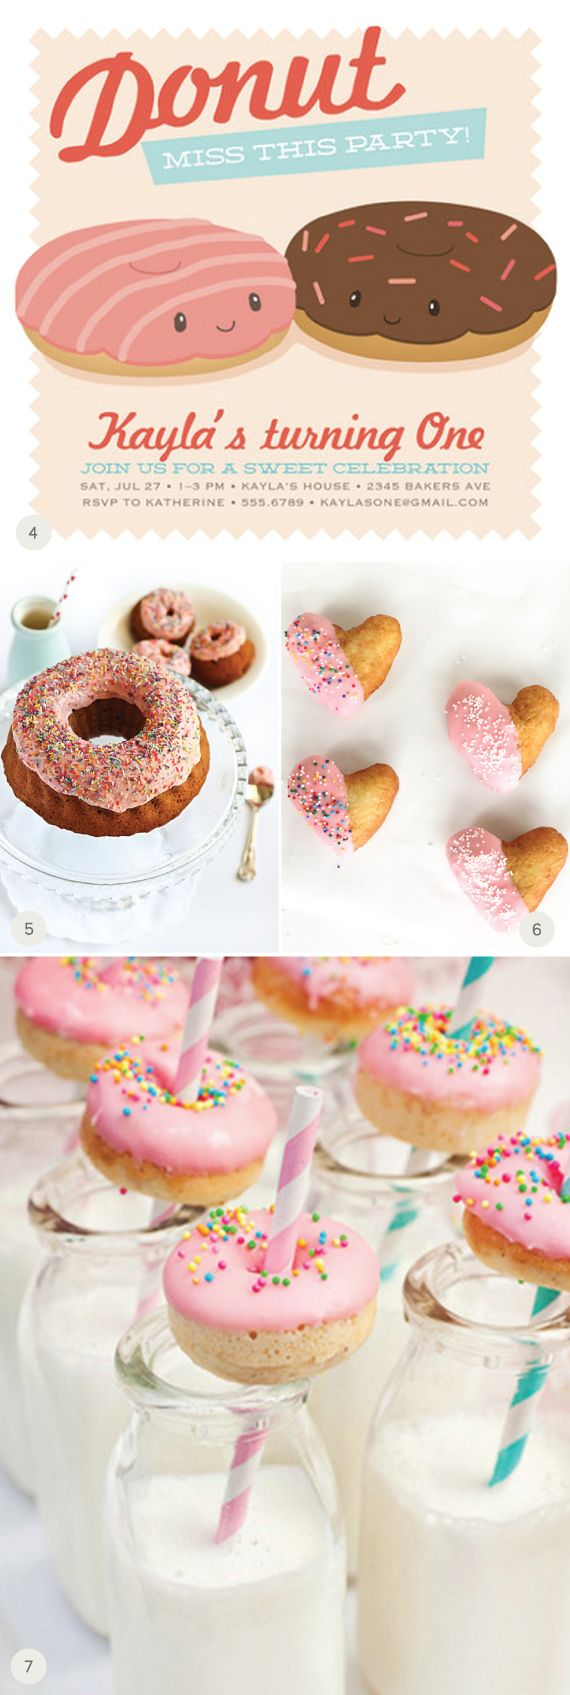 Party with Donuts: Donut Invitation, Donut Birthday Party Ideas, Kids Birthday, Donuts Stylishkidsparties, Cute Donuts, Cute Donut Ideas, Party Donut, Donut Invite, Birthday Ideas